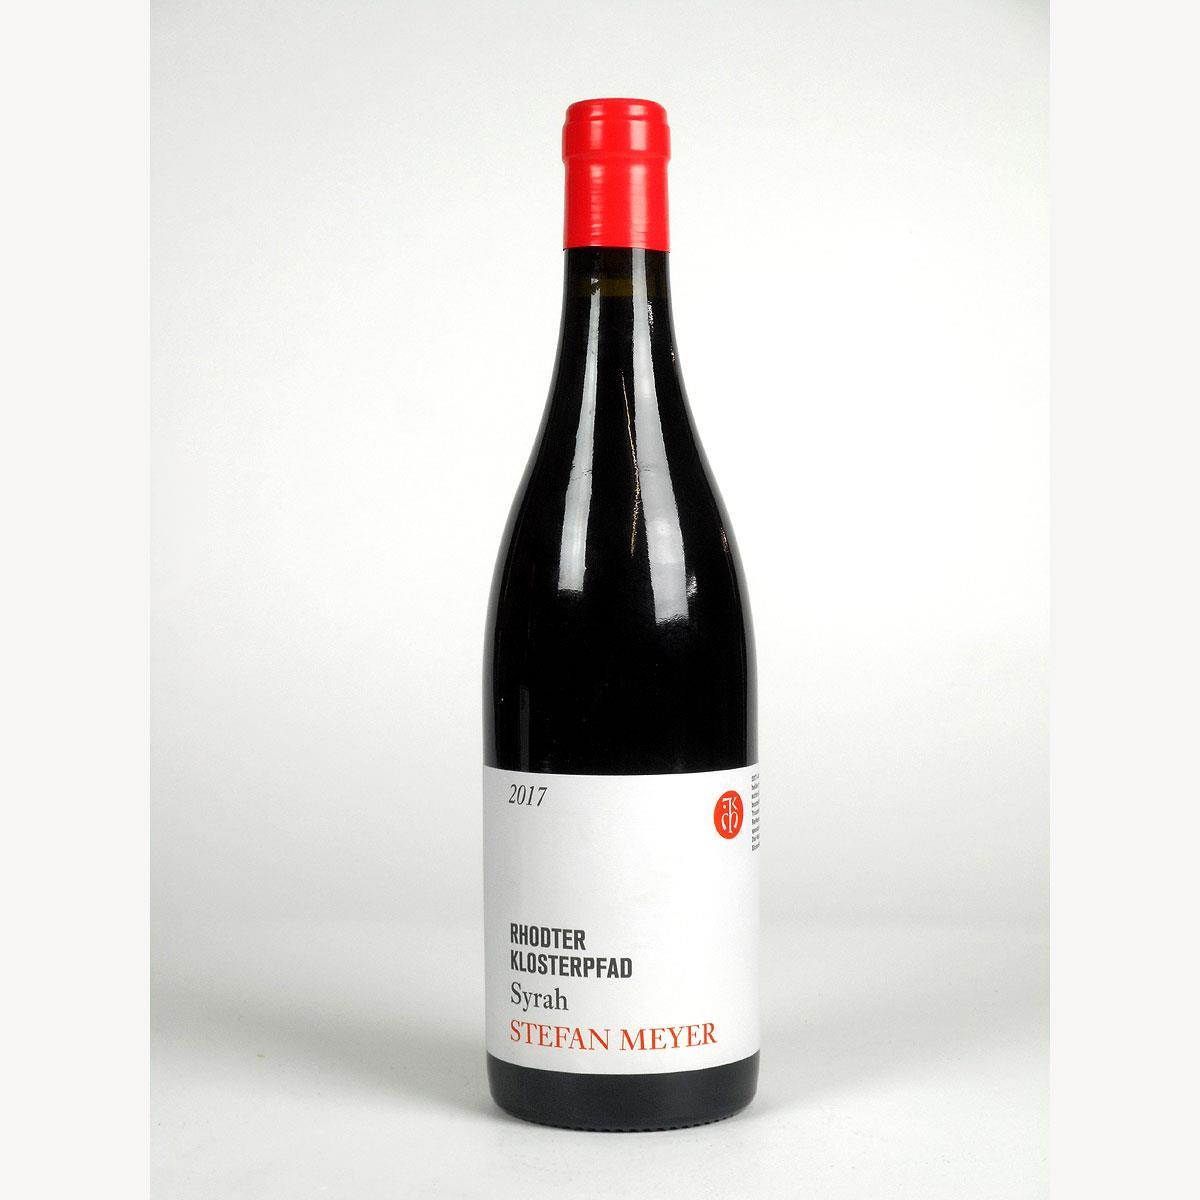 Pfalz: Stefan Meyer 'Rhodter Klosterpfad' Syrah 2017 - Bottle